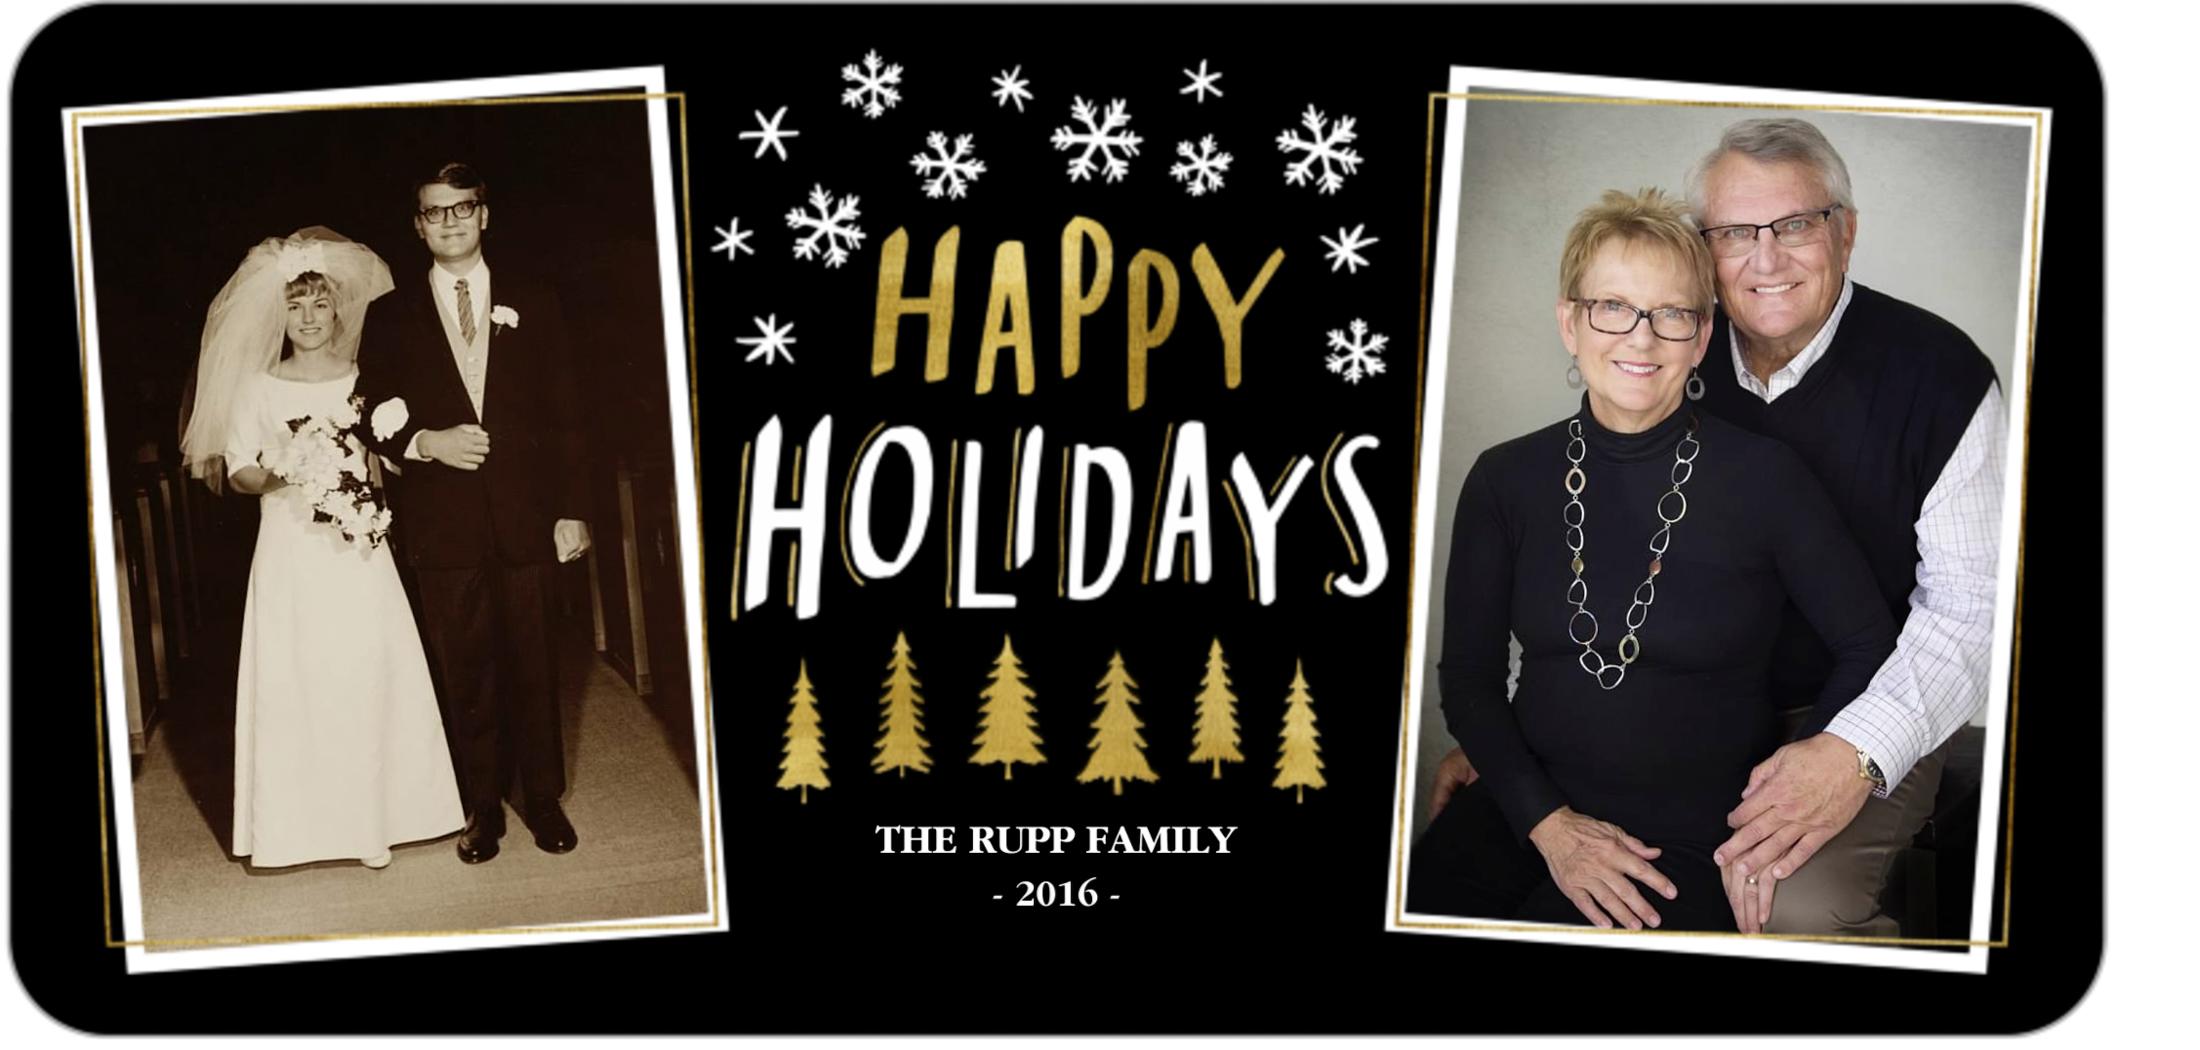 Rupp Christmas Card Samples 002.jpg